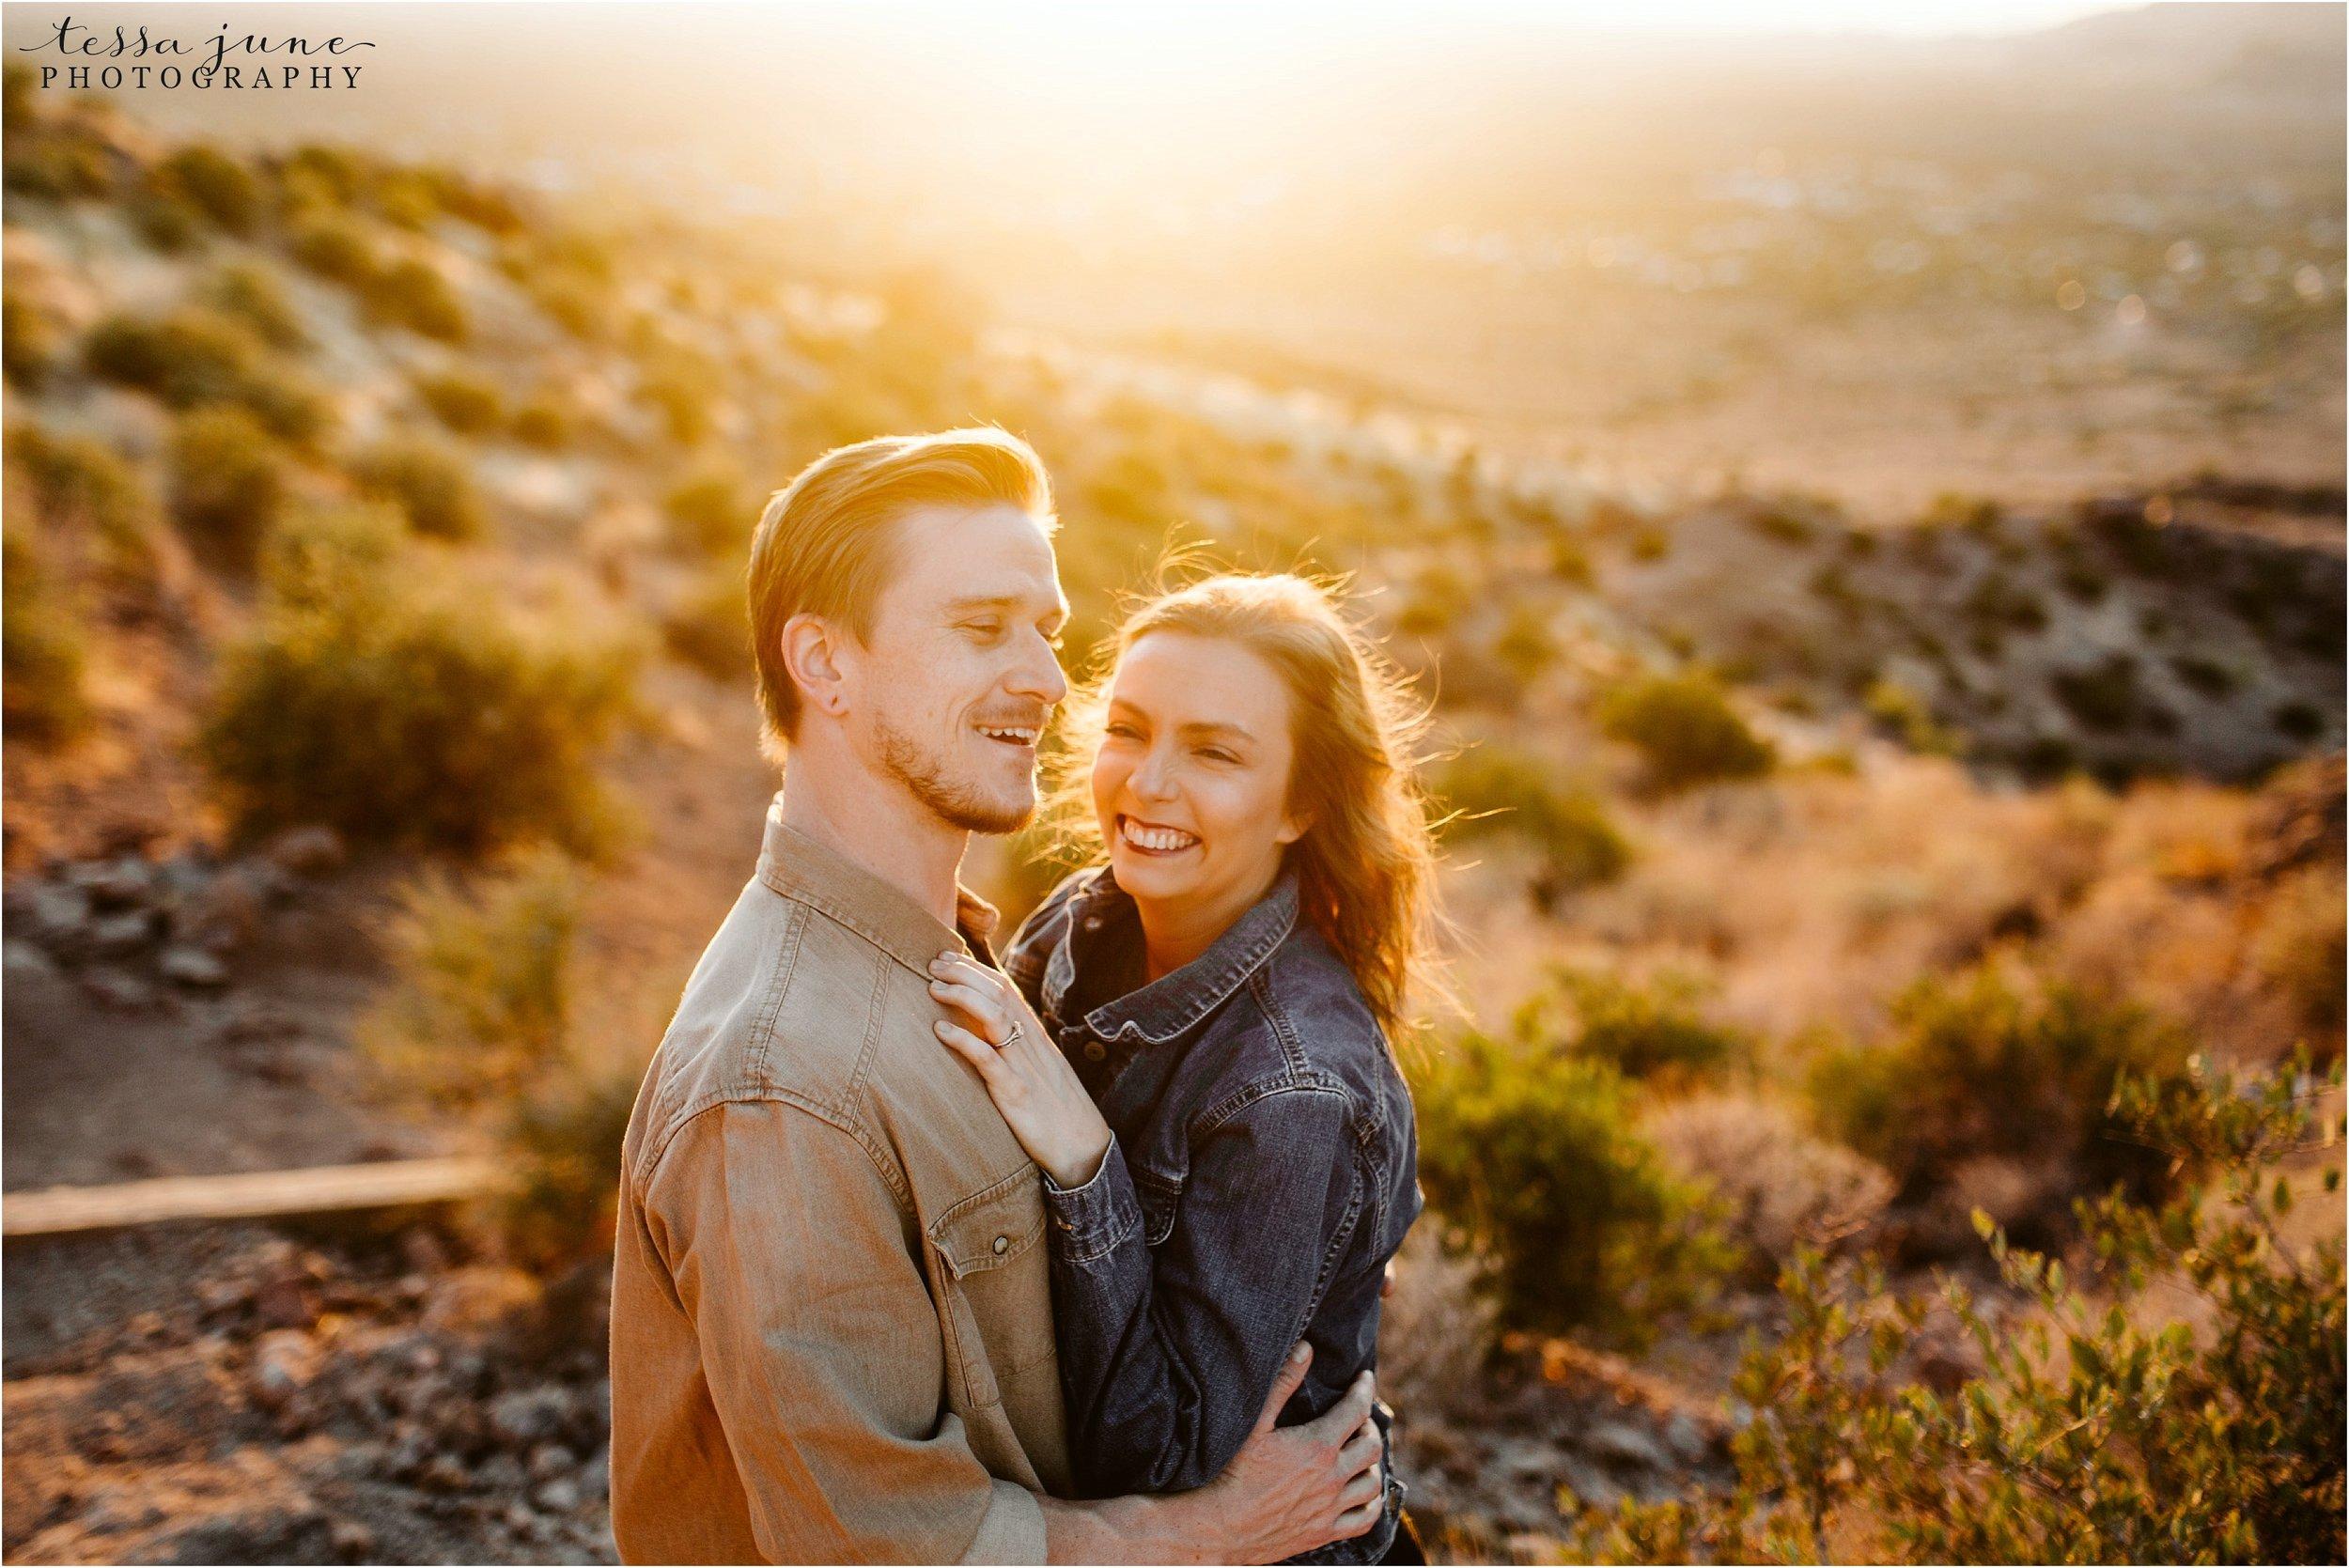 lost-dutchman-state-park-engagement-arizona-destination-photographer-phoenix-15.jpg